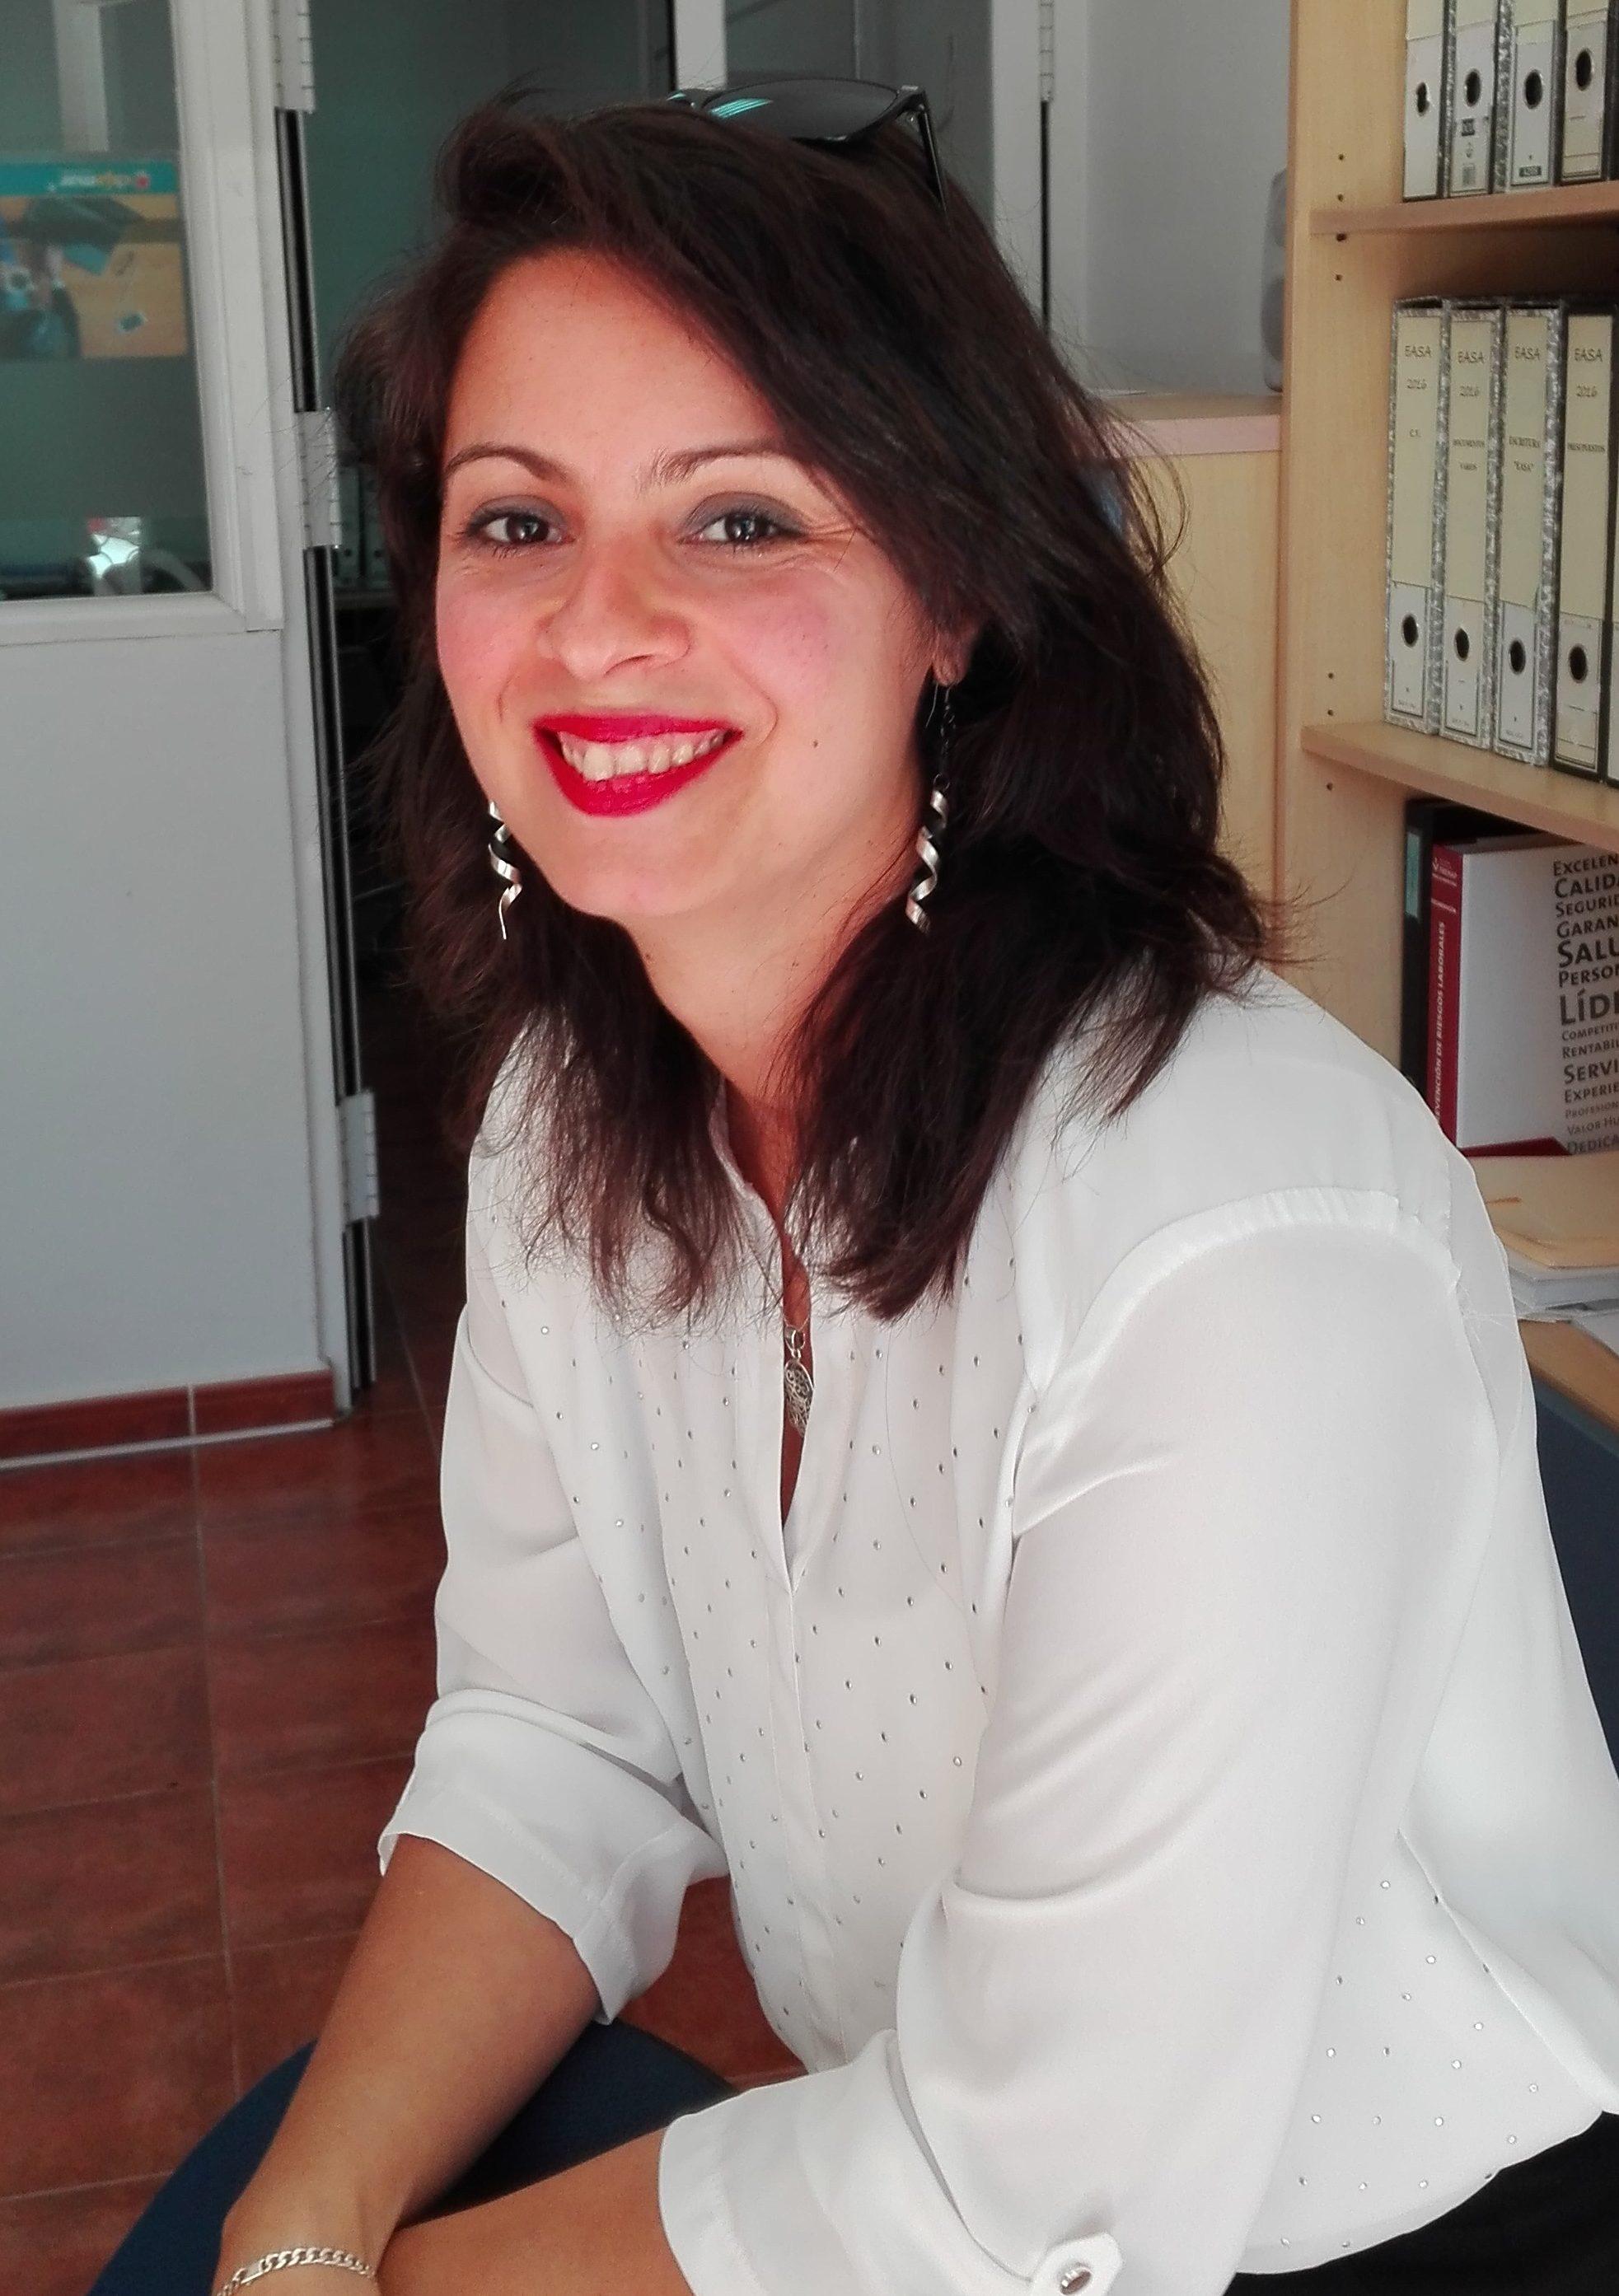 Inés López | Jefa de administración de BOHR AdministracionesInés López | Jefa de administración de BOHR Administraciones